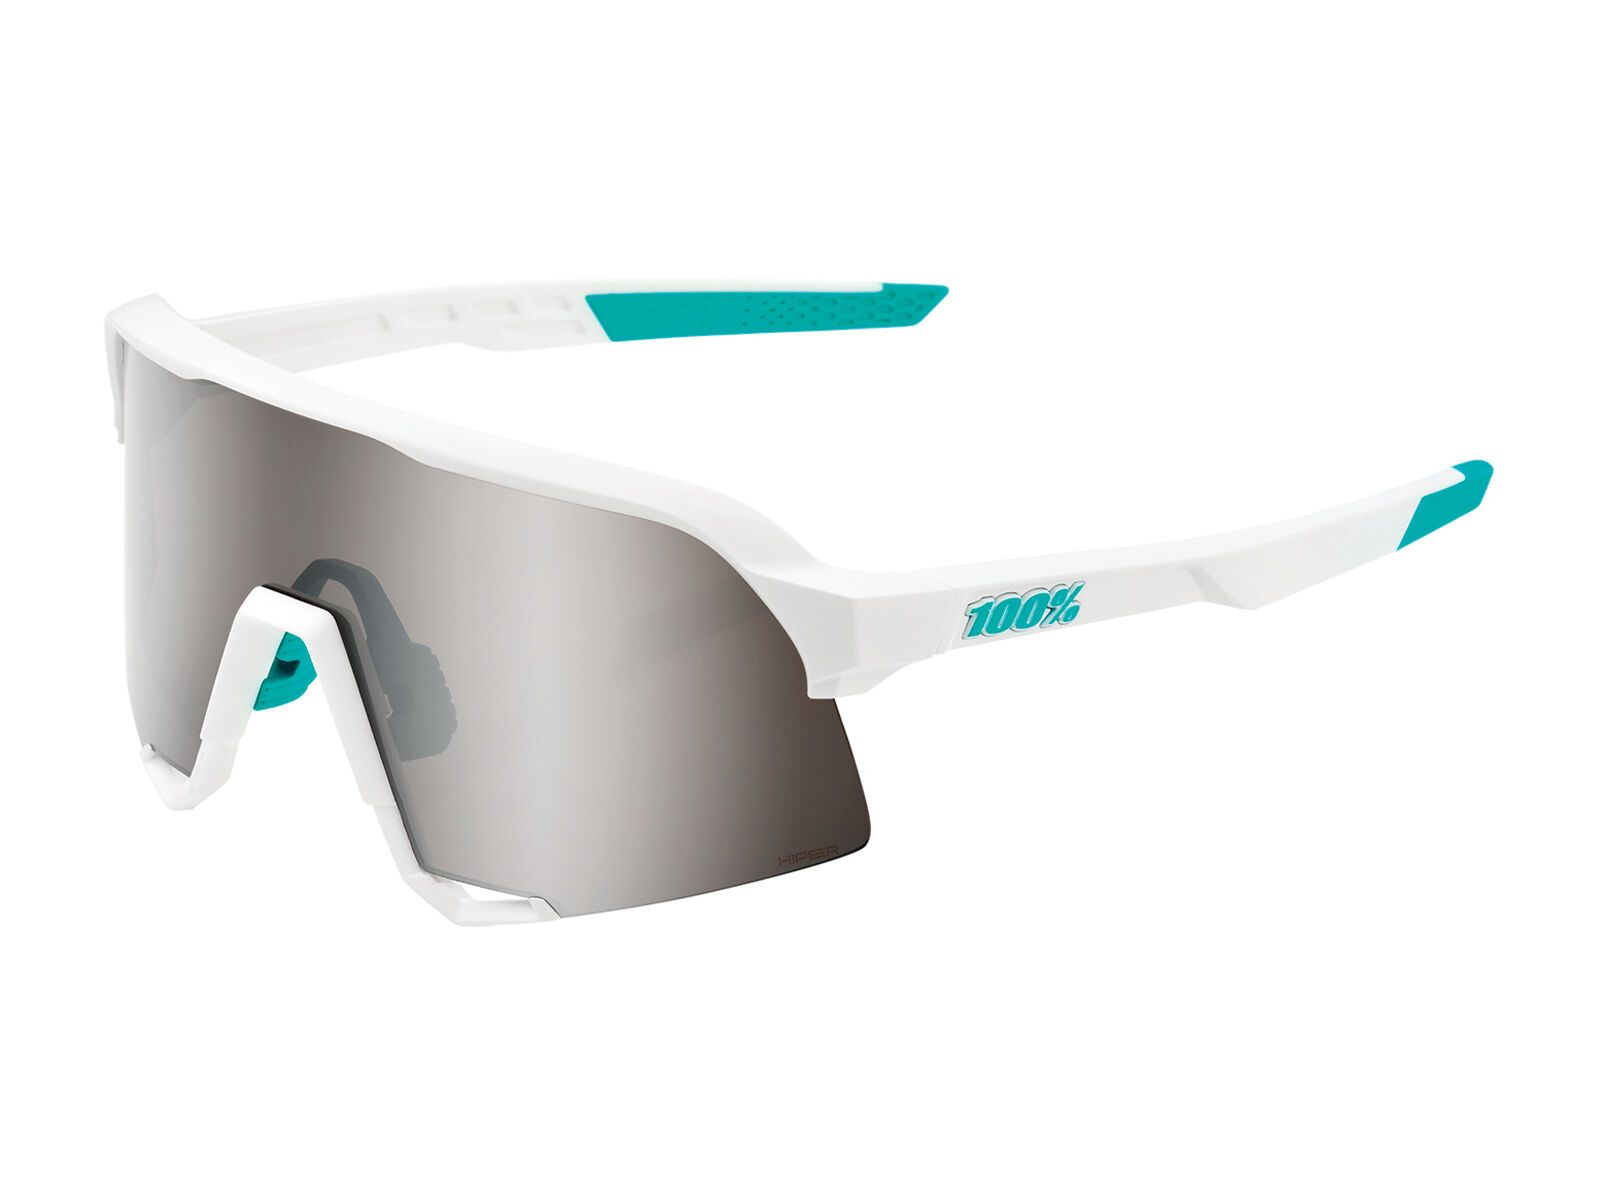 100% S3 Bora-Hansgrohe – HiPER Silver Mir team white HU-GLA-0118/1216/unis